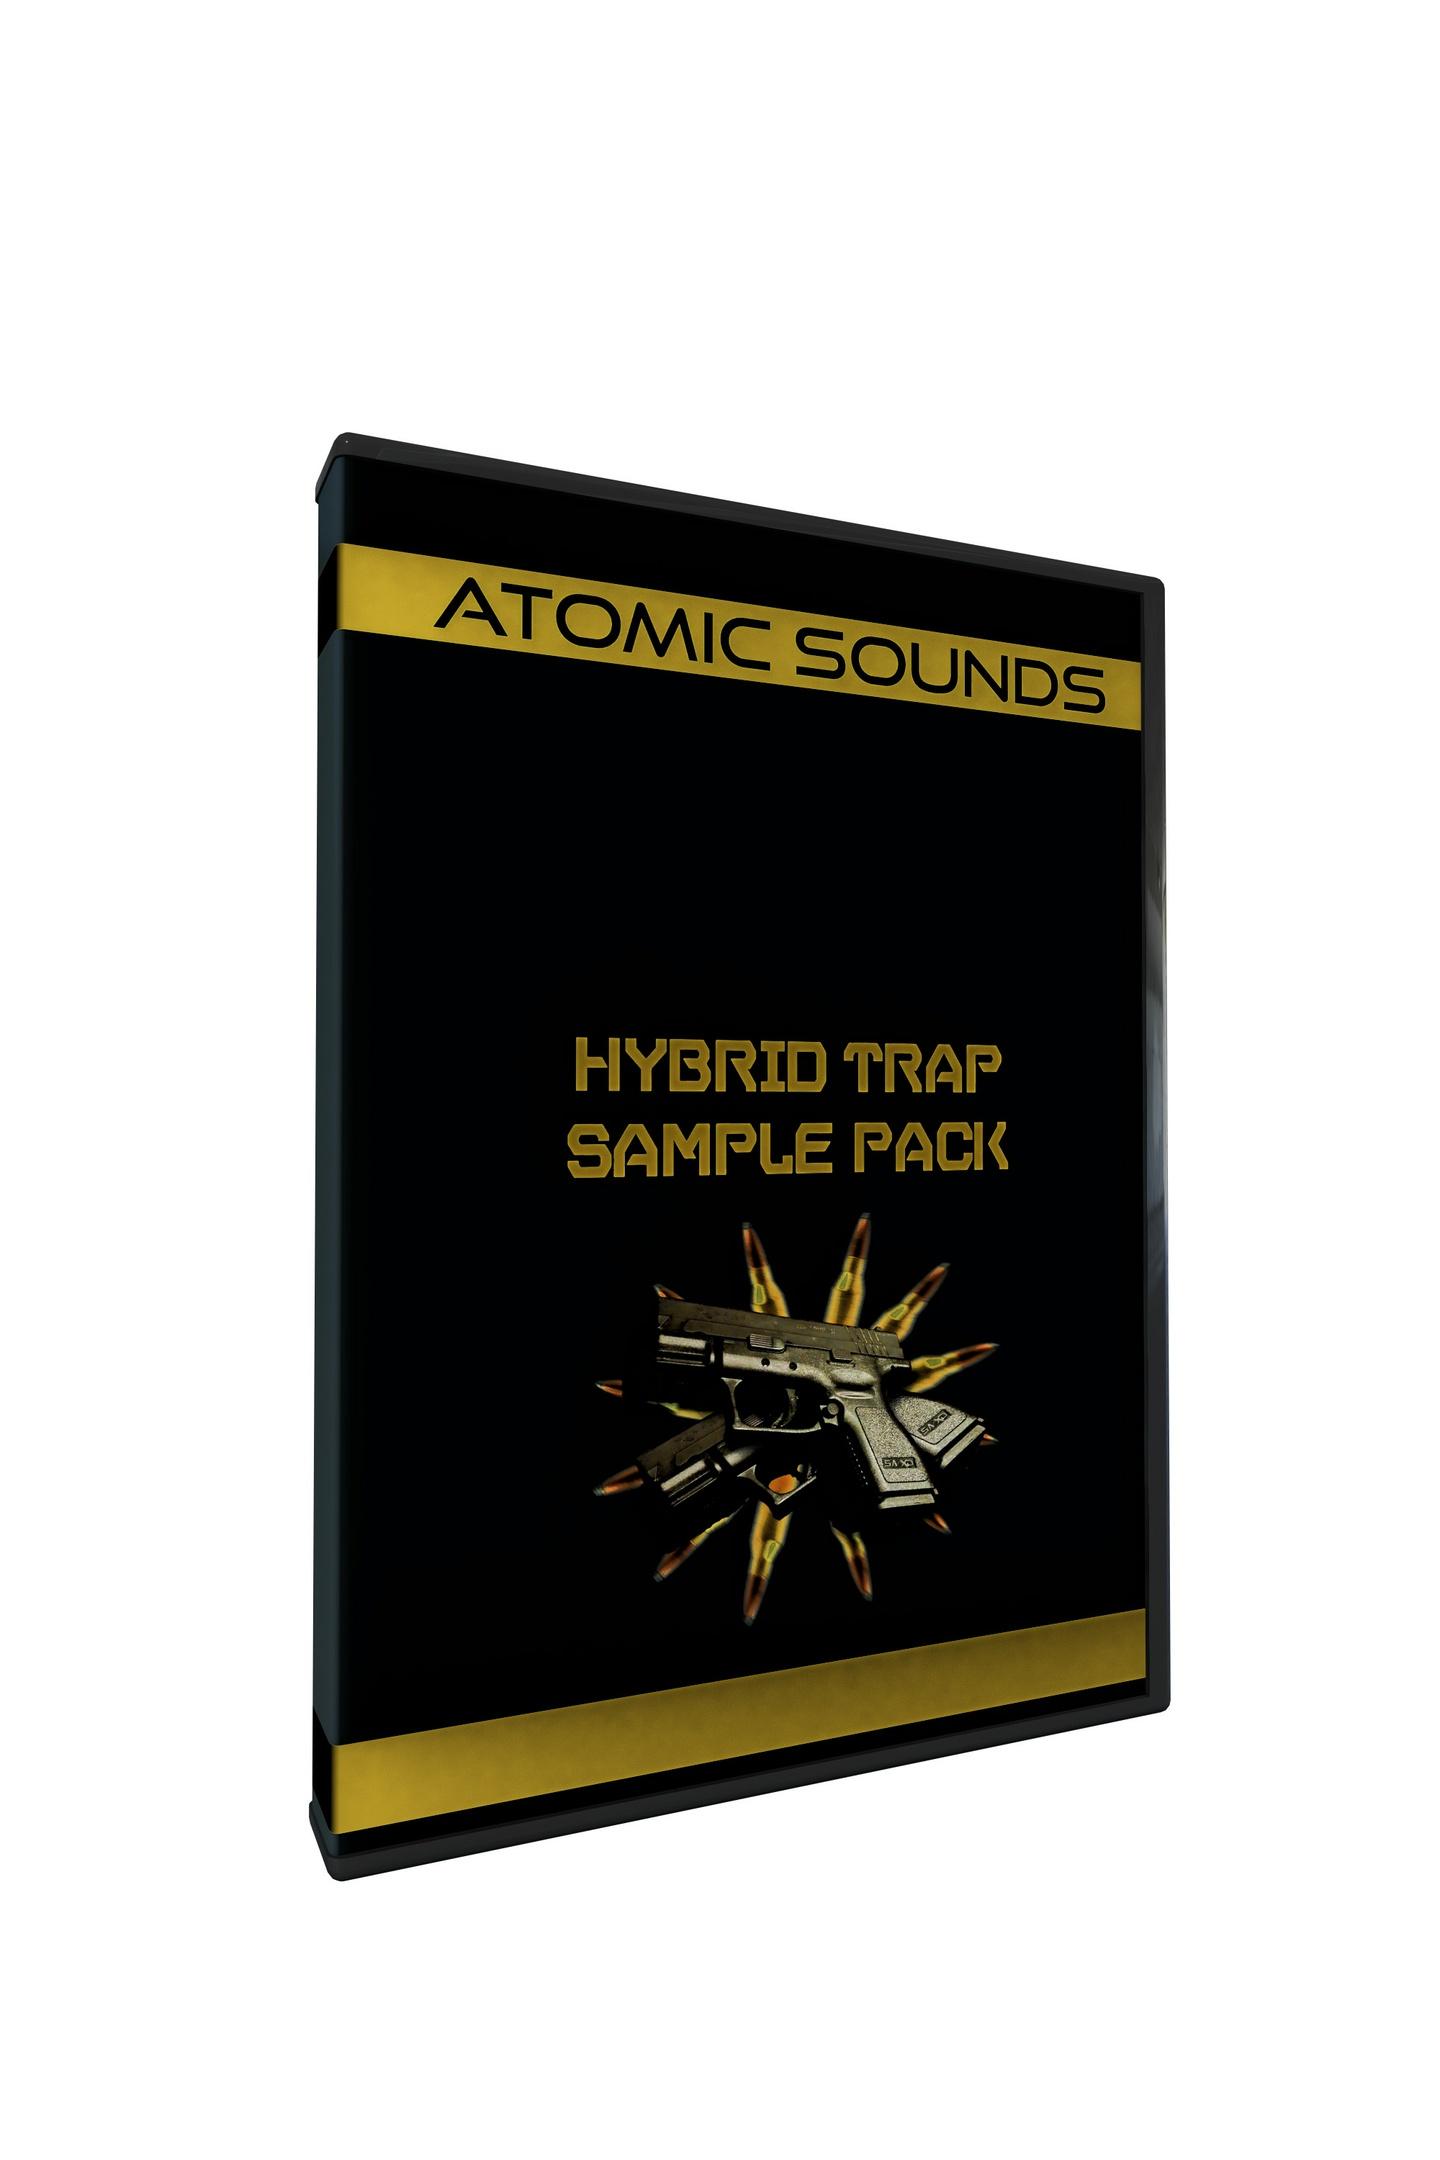 Atomic Sounds - Hybrid Trap Sample Pack